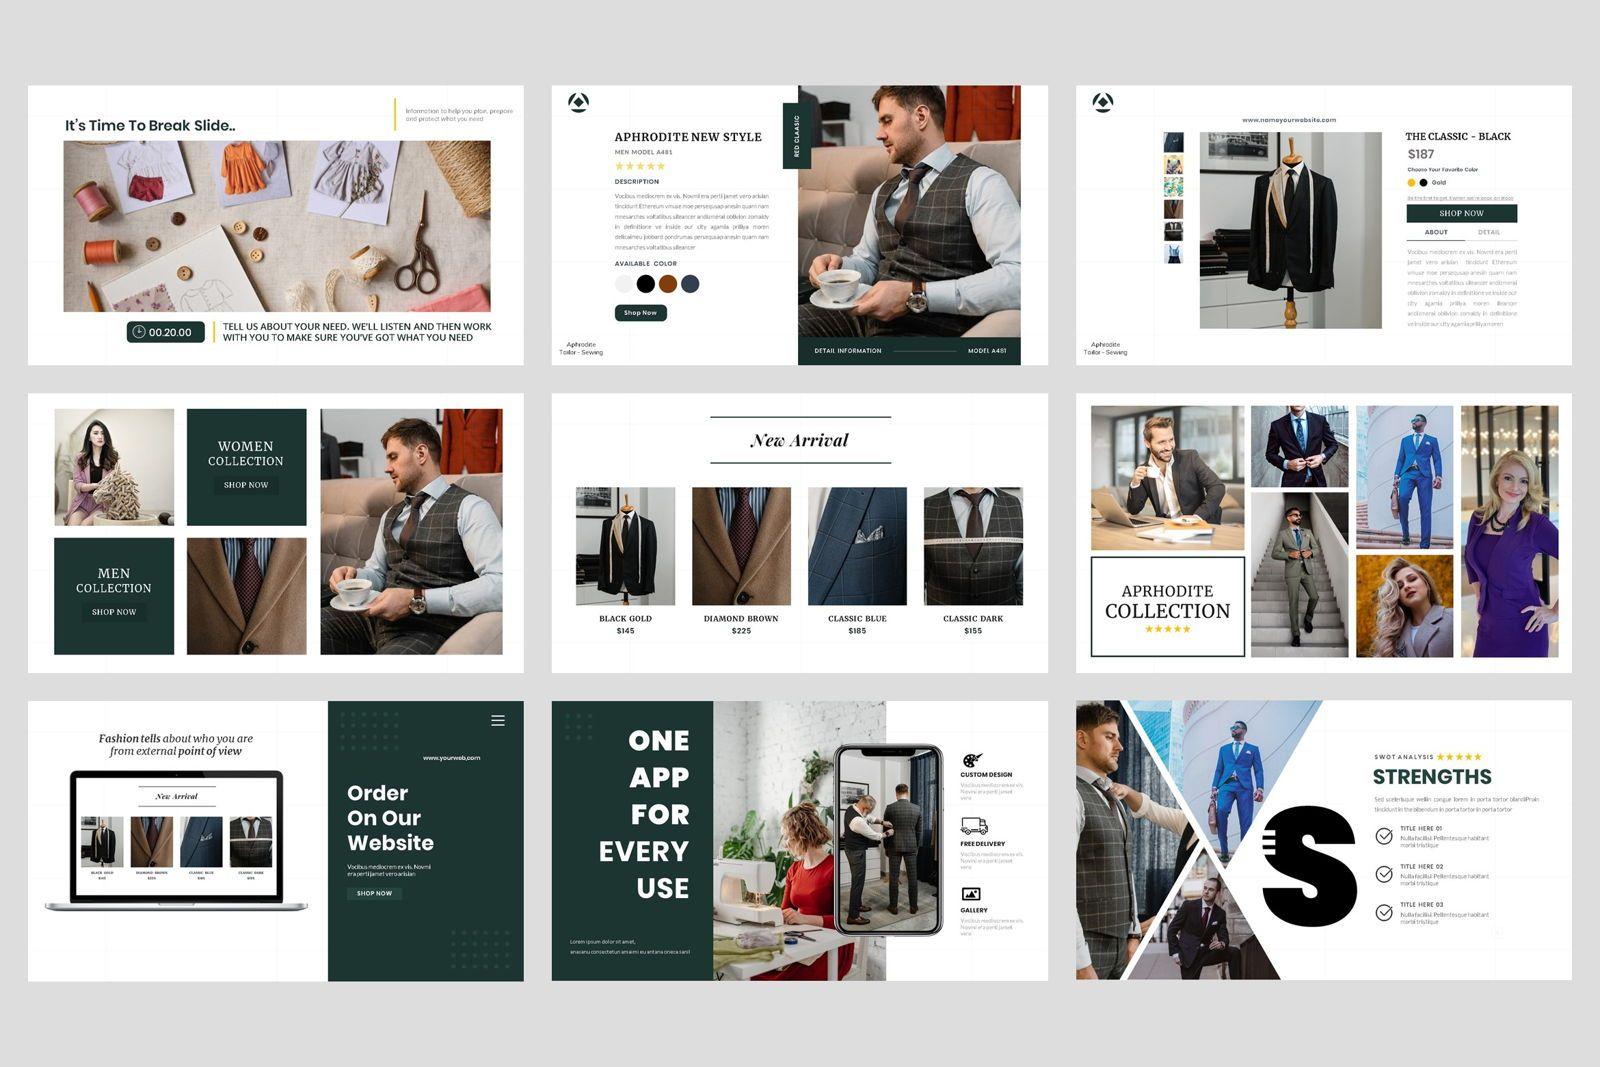 Tailor - Sewing Fashion Craft Google Slide Template, Slide 4, 08621, Business Models — PoweredTemplate.com